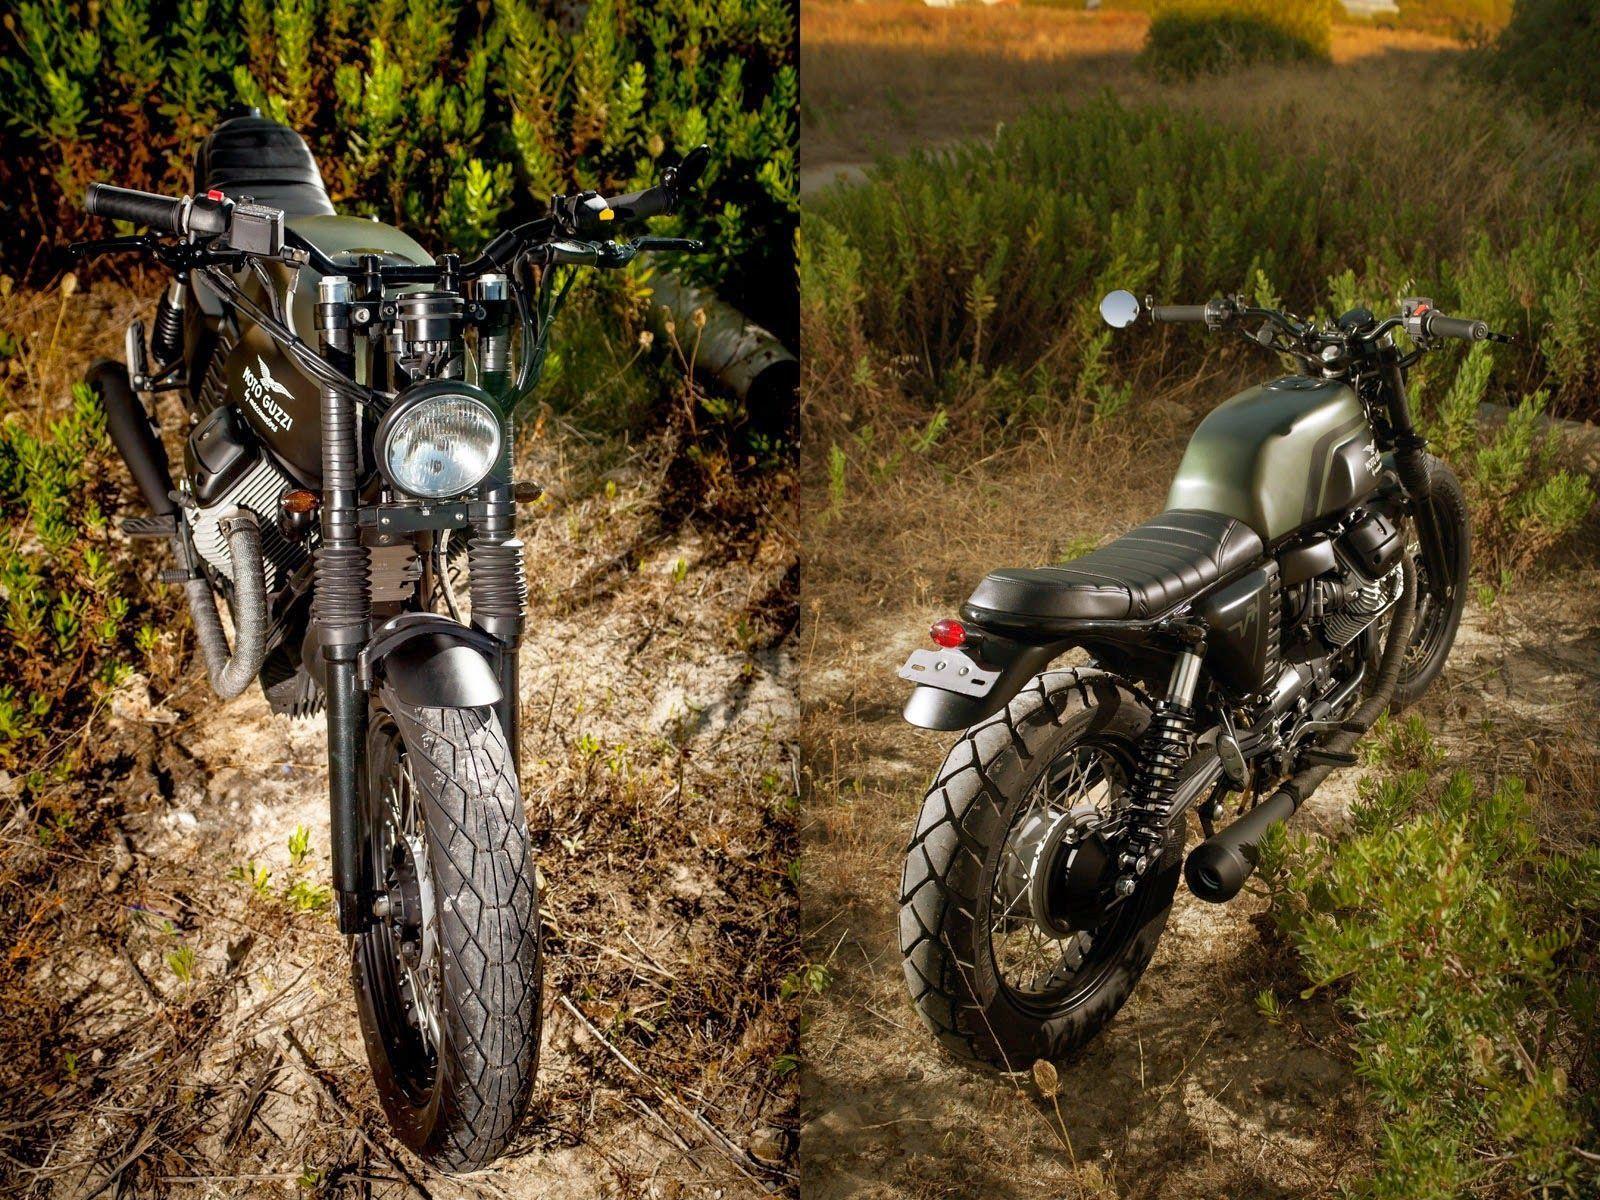 2008 Moto Guzzi V-7 TWIN | Macco Motors Mr. Green